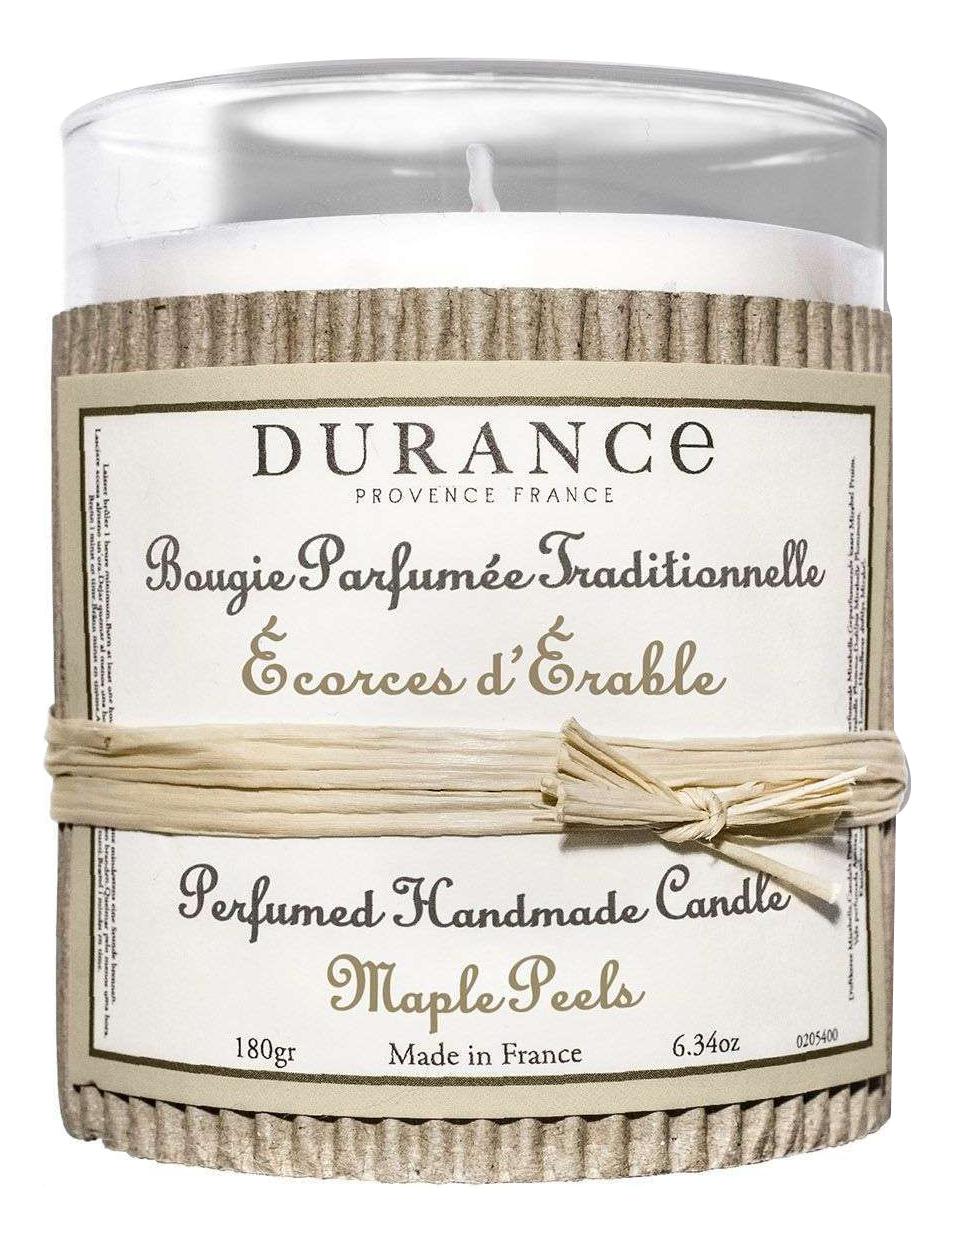 Купить Ароматическая свеча Bougie Parfumee Fraditionnelli Ecorces D'erable 180г (кора дуба), Durance